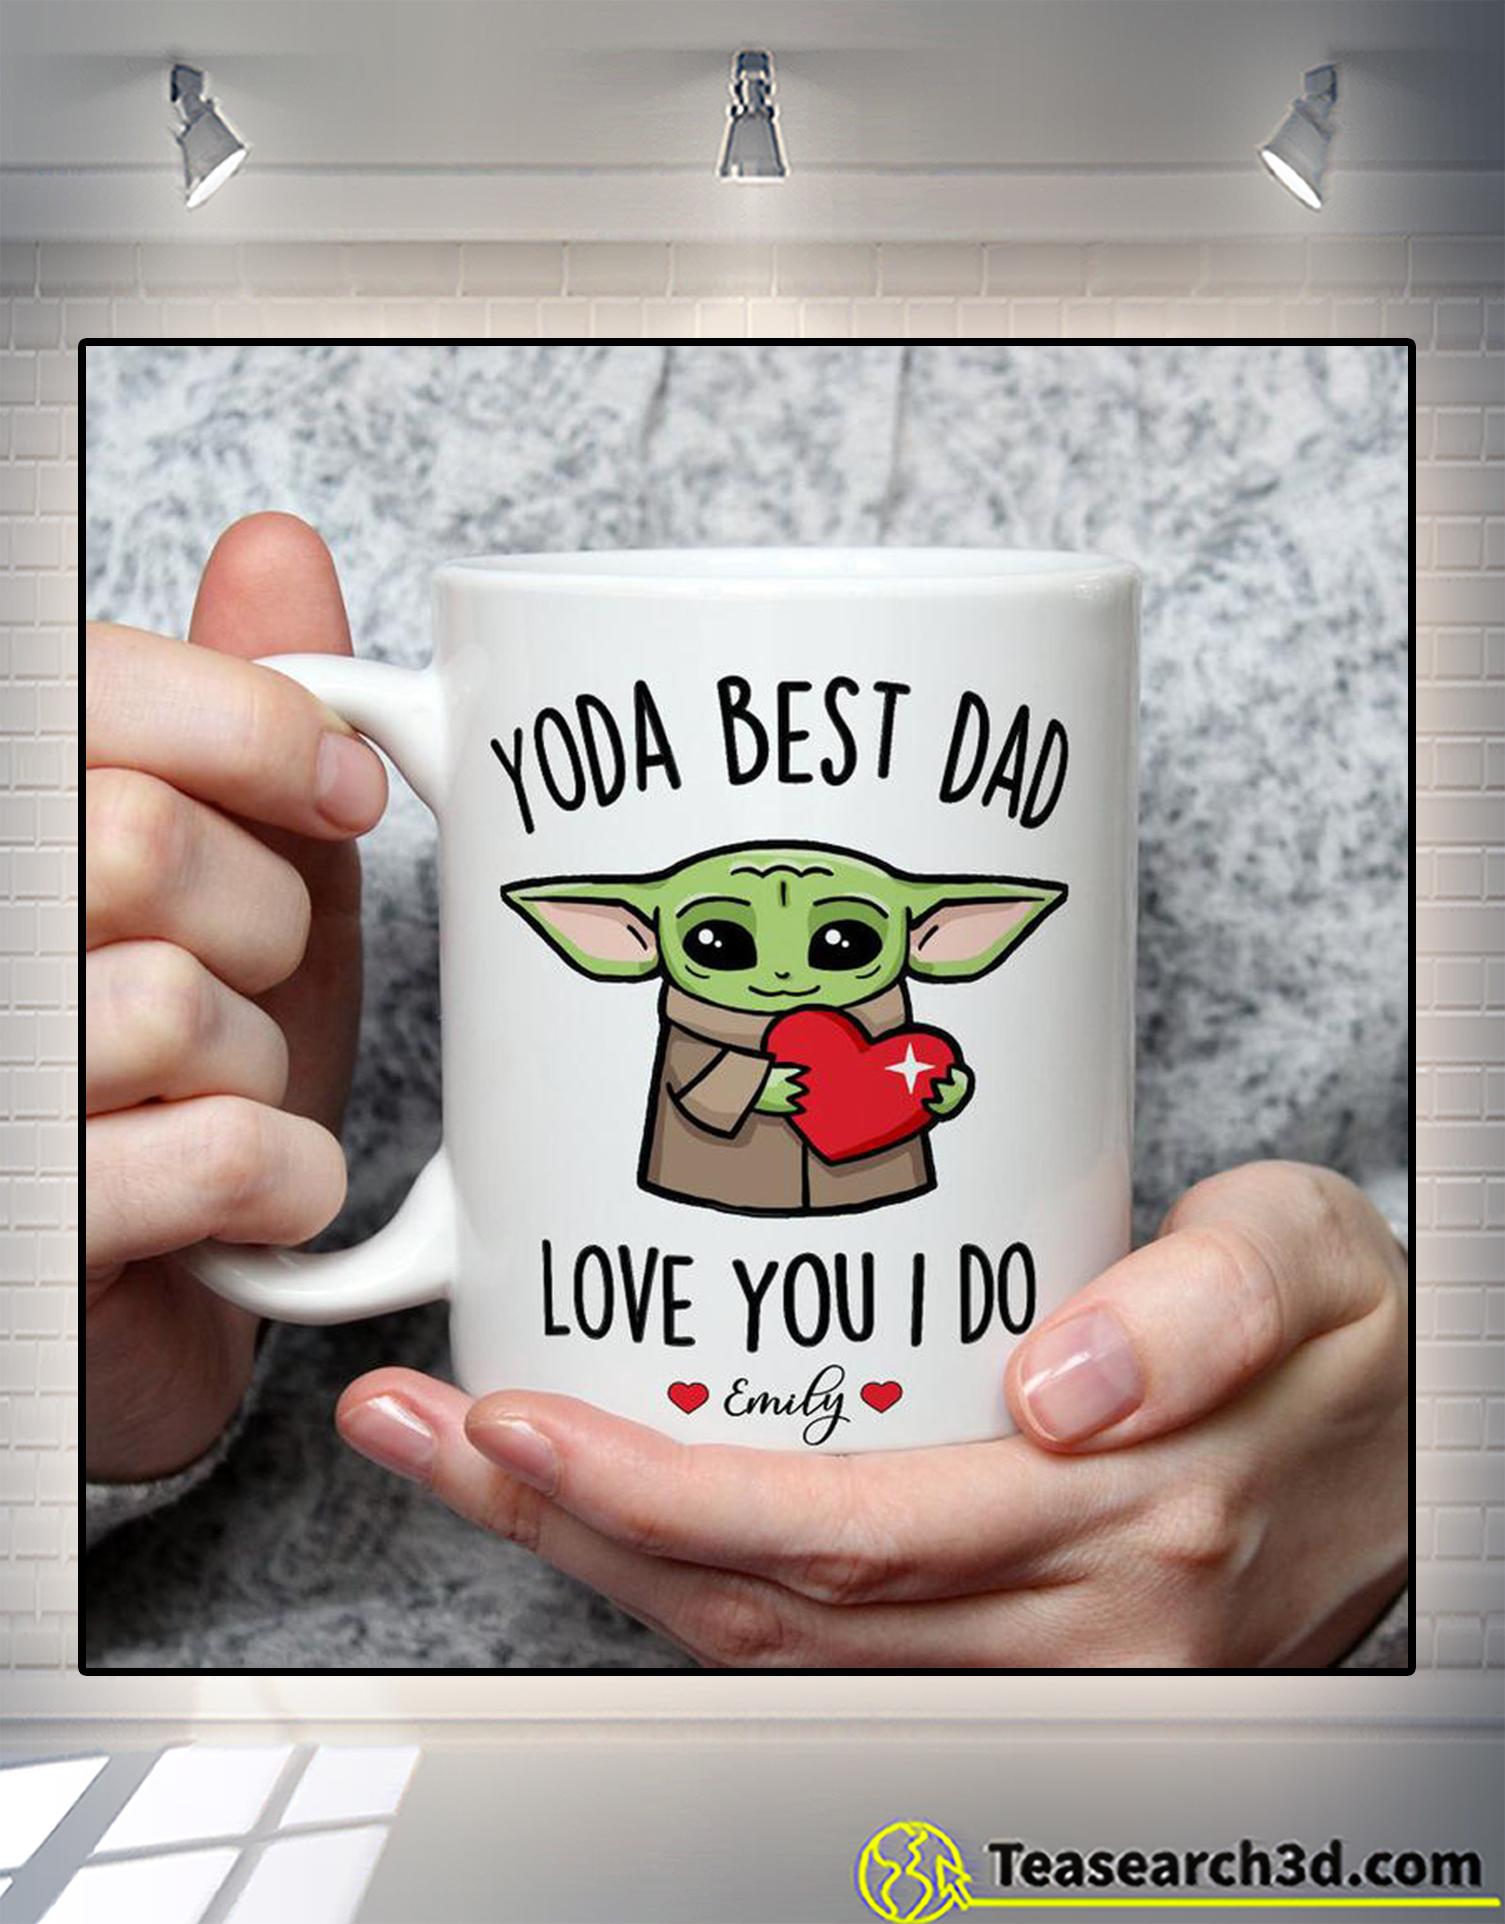 Personalized custom name baby yoda best dad love you I do mug